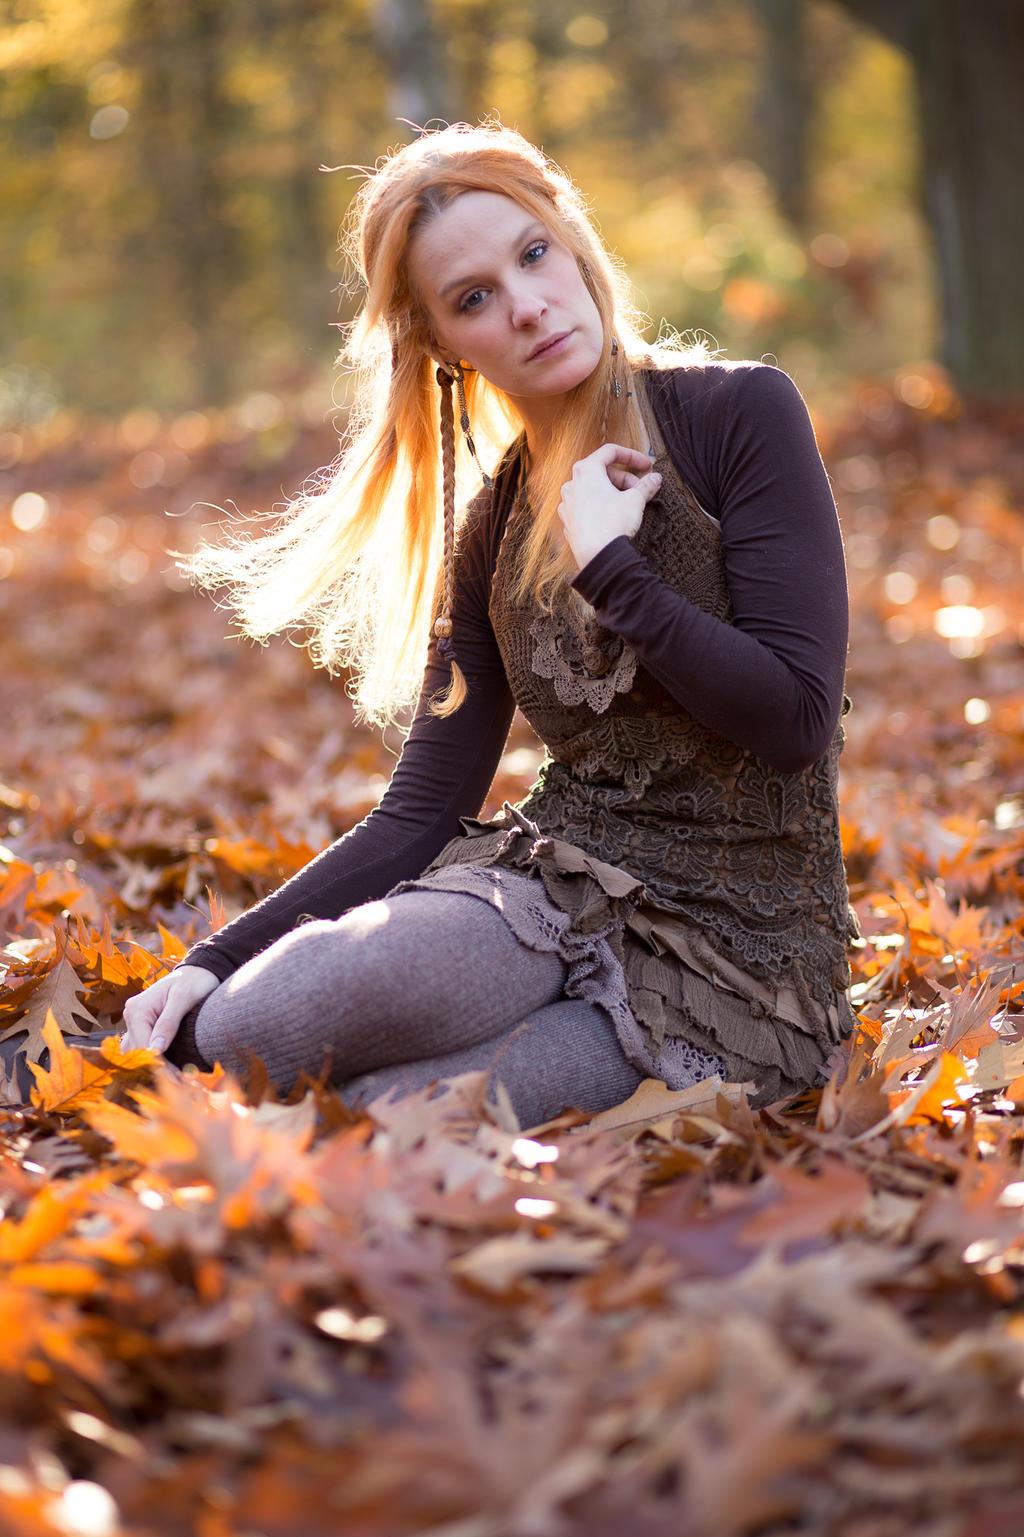 Autumn 02 by Fuchsfee-Stock